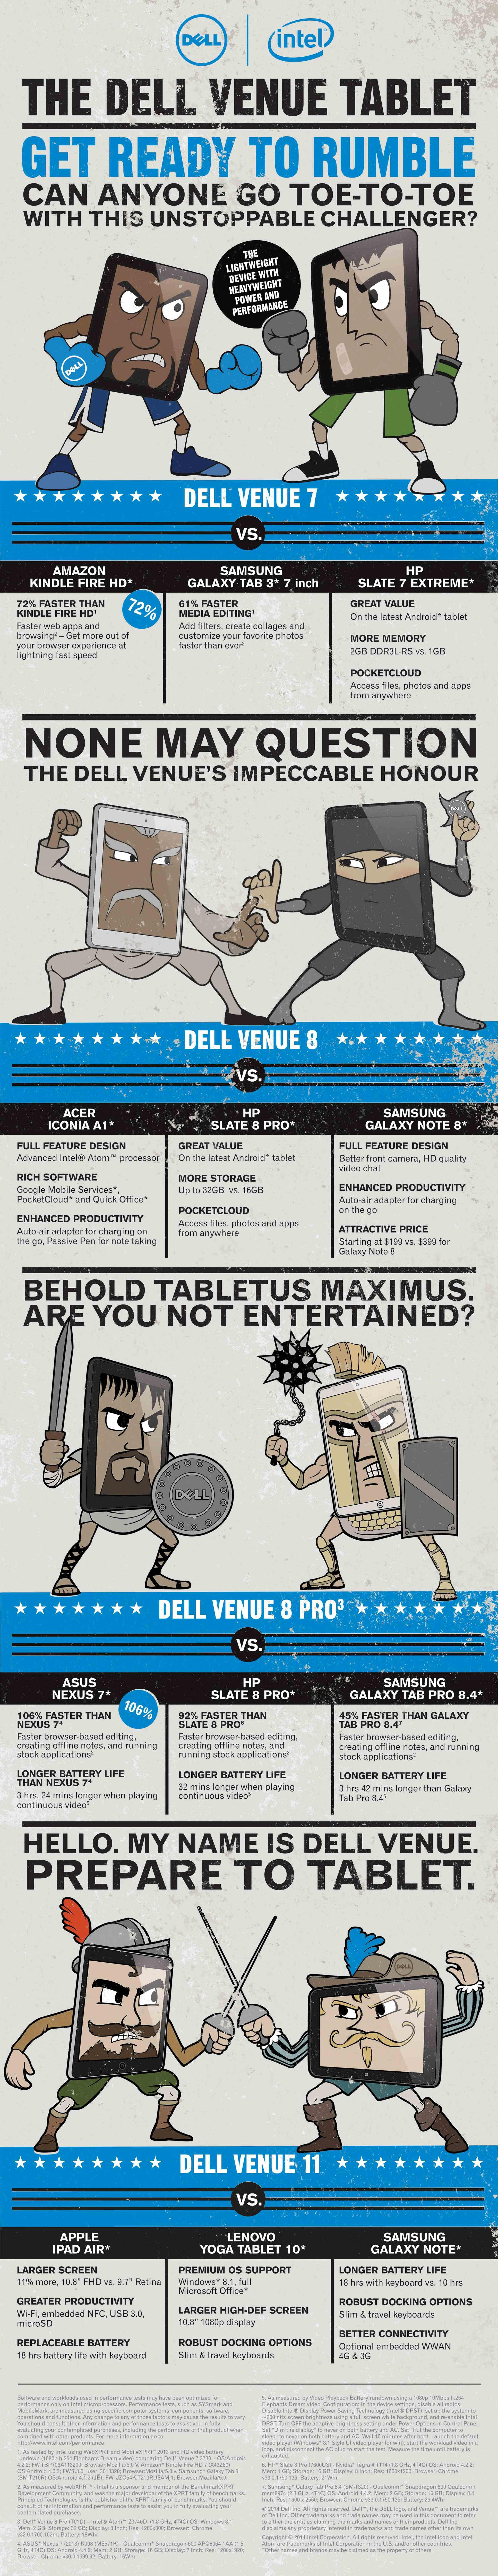 INT-0938_Tablet_Center_Large-Poster.jpg